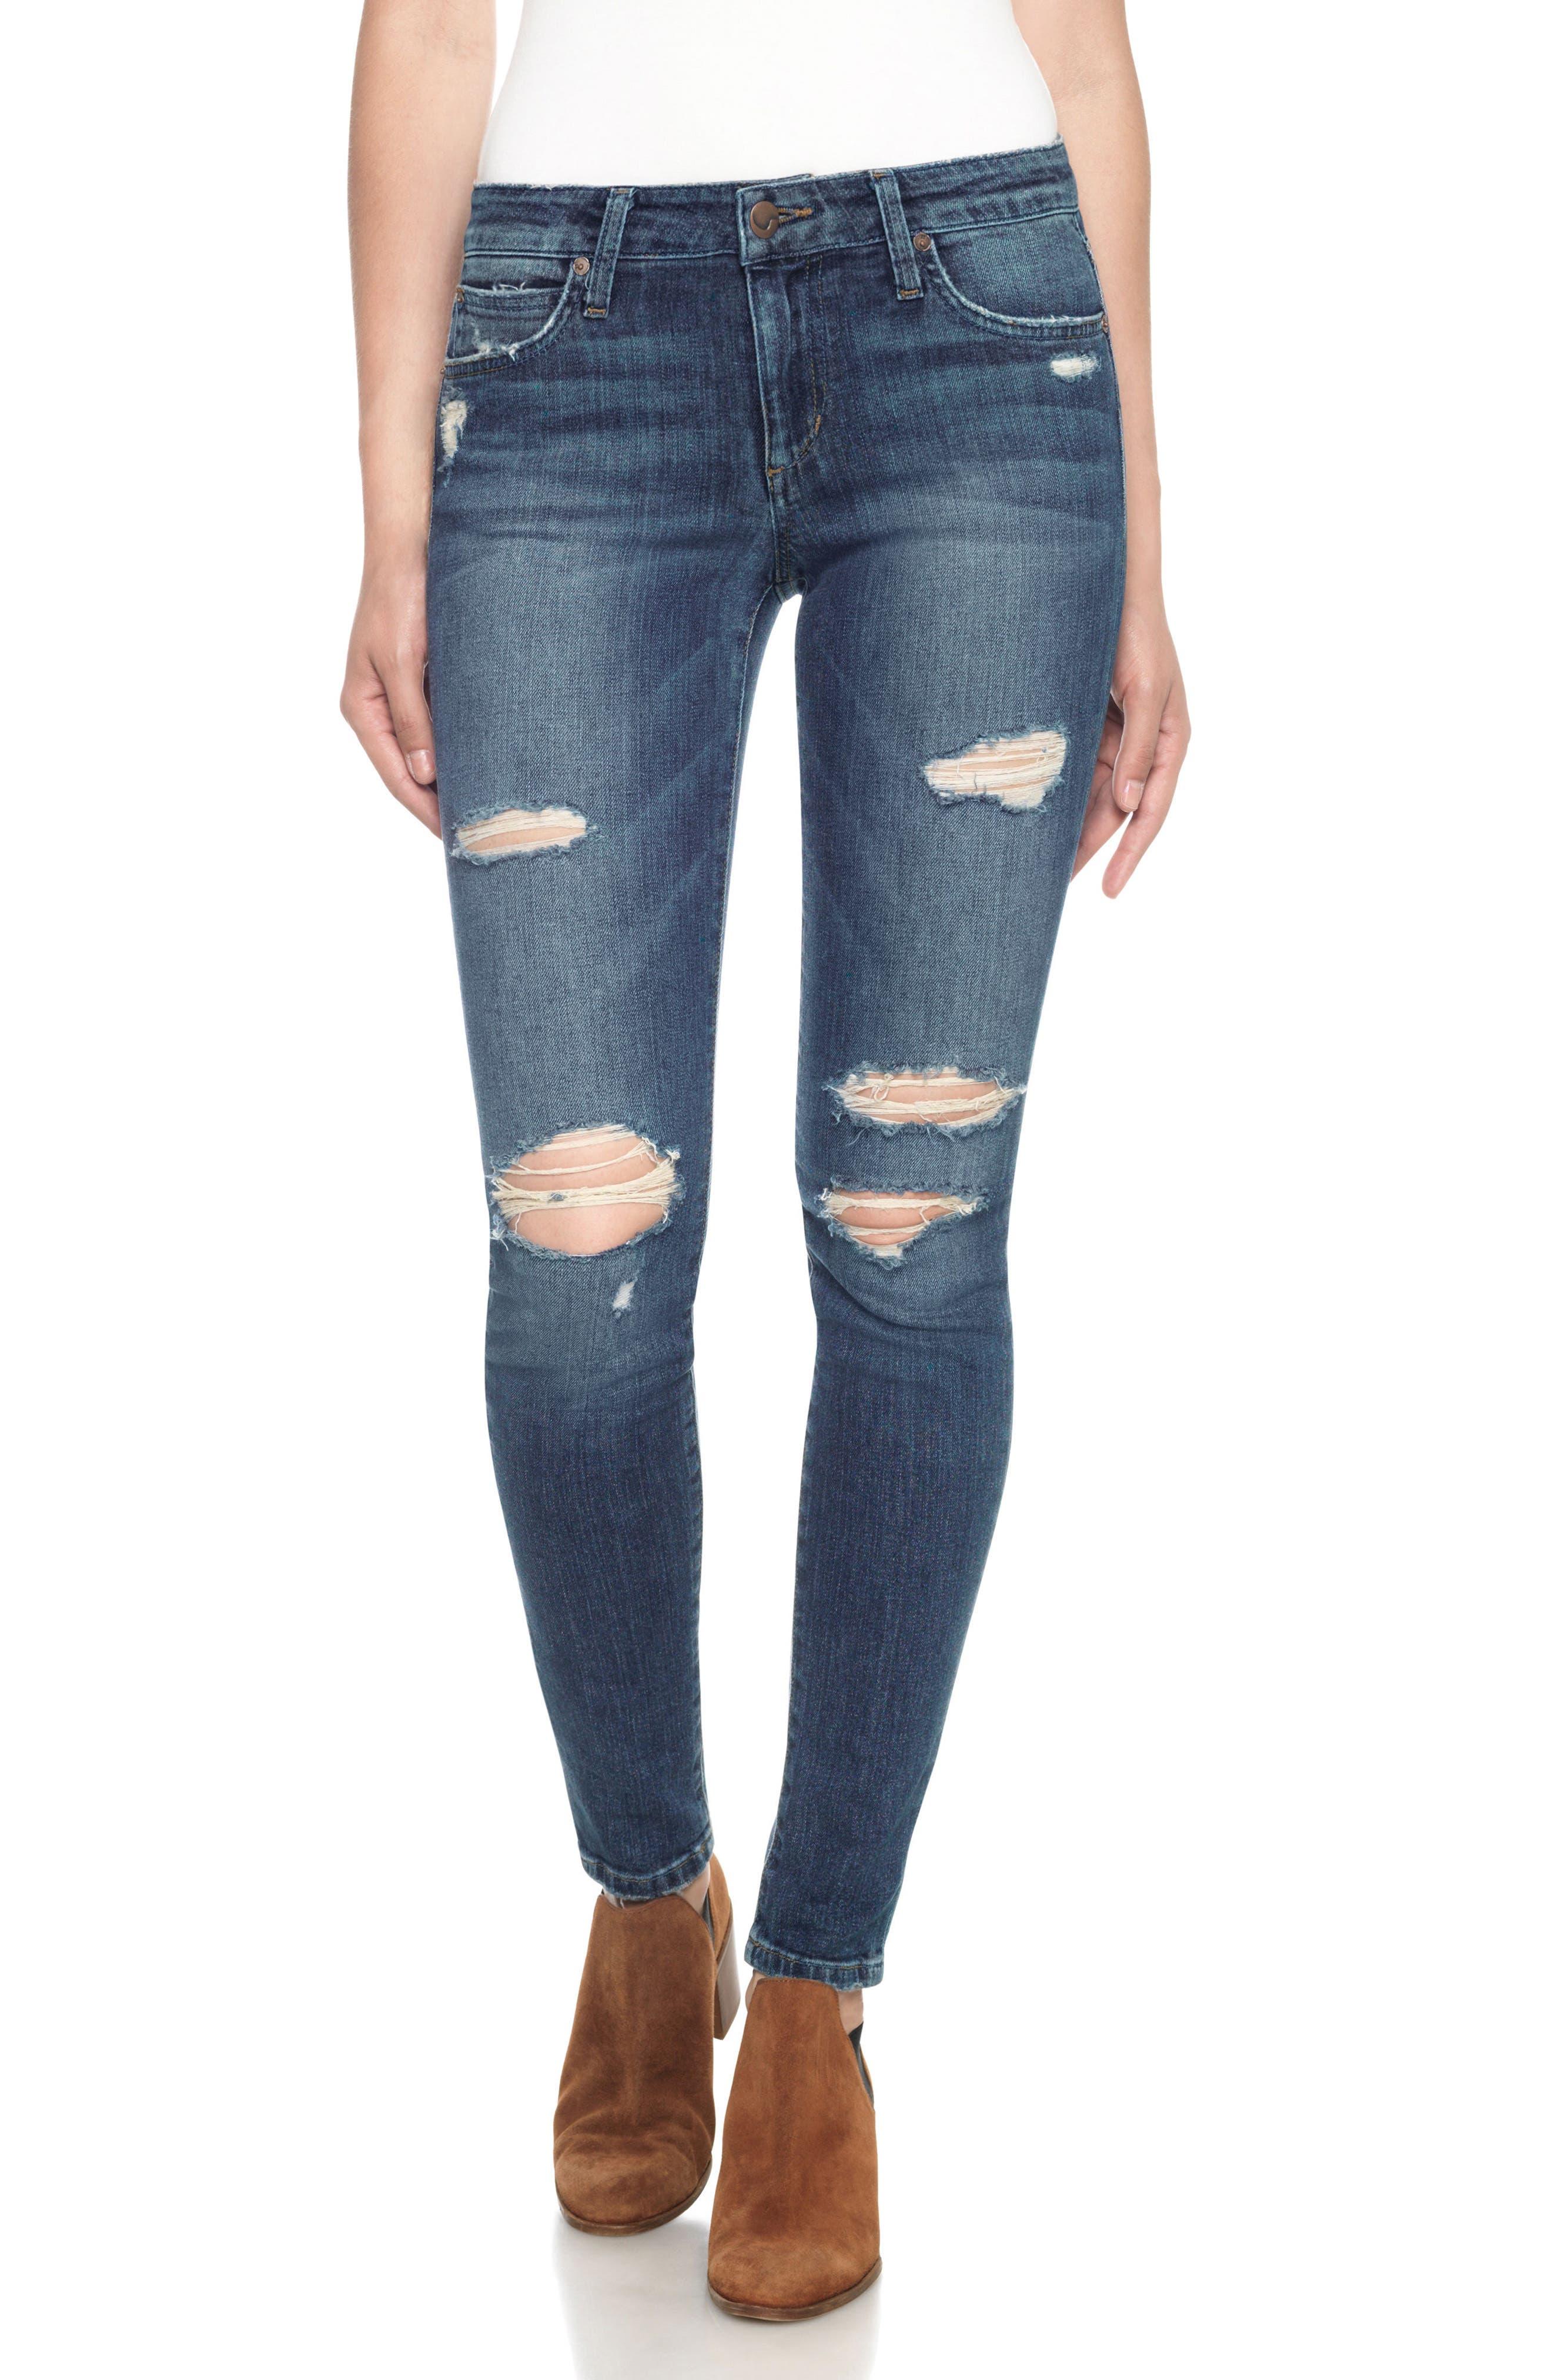 Alternate Image 1 Selected - Joe's 'The Icon' Skinny Jeans (Seneka)